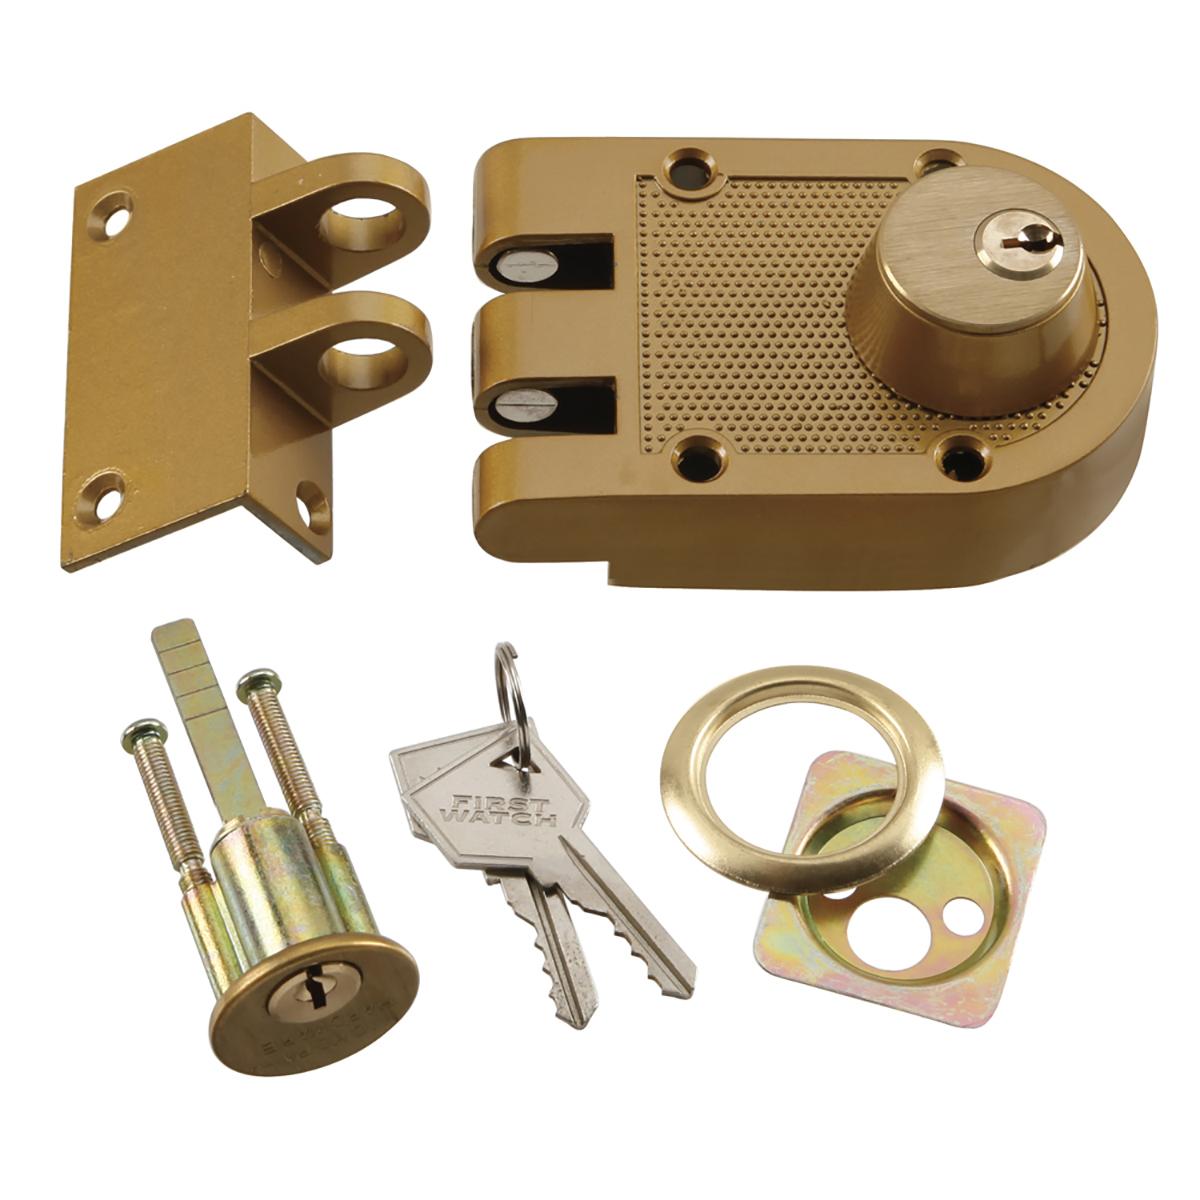 Double Cylinder Interlocking Deadbolt - First Watch Security